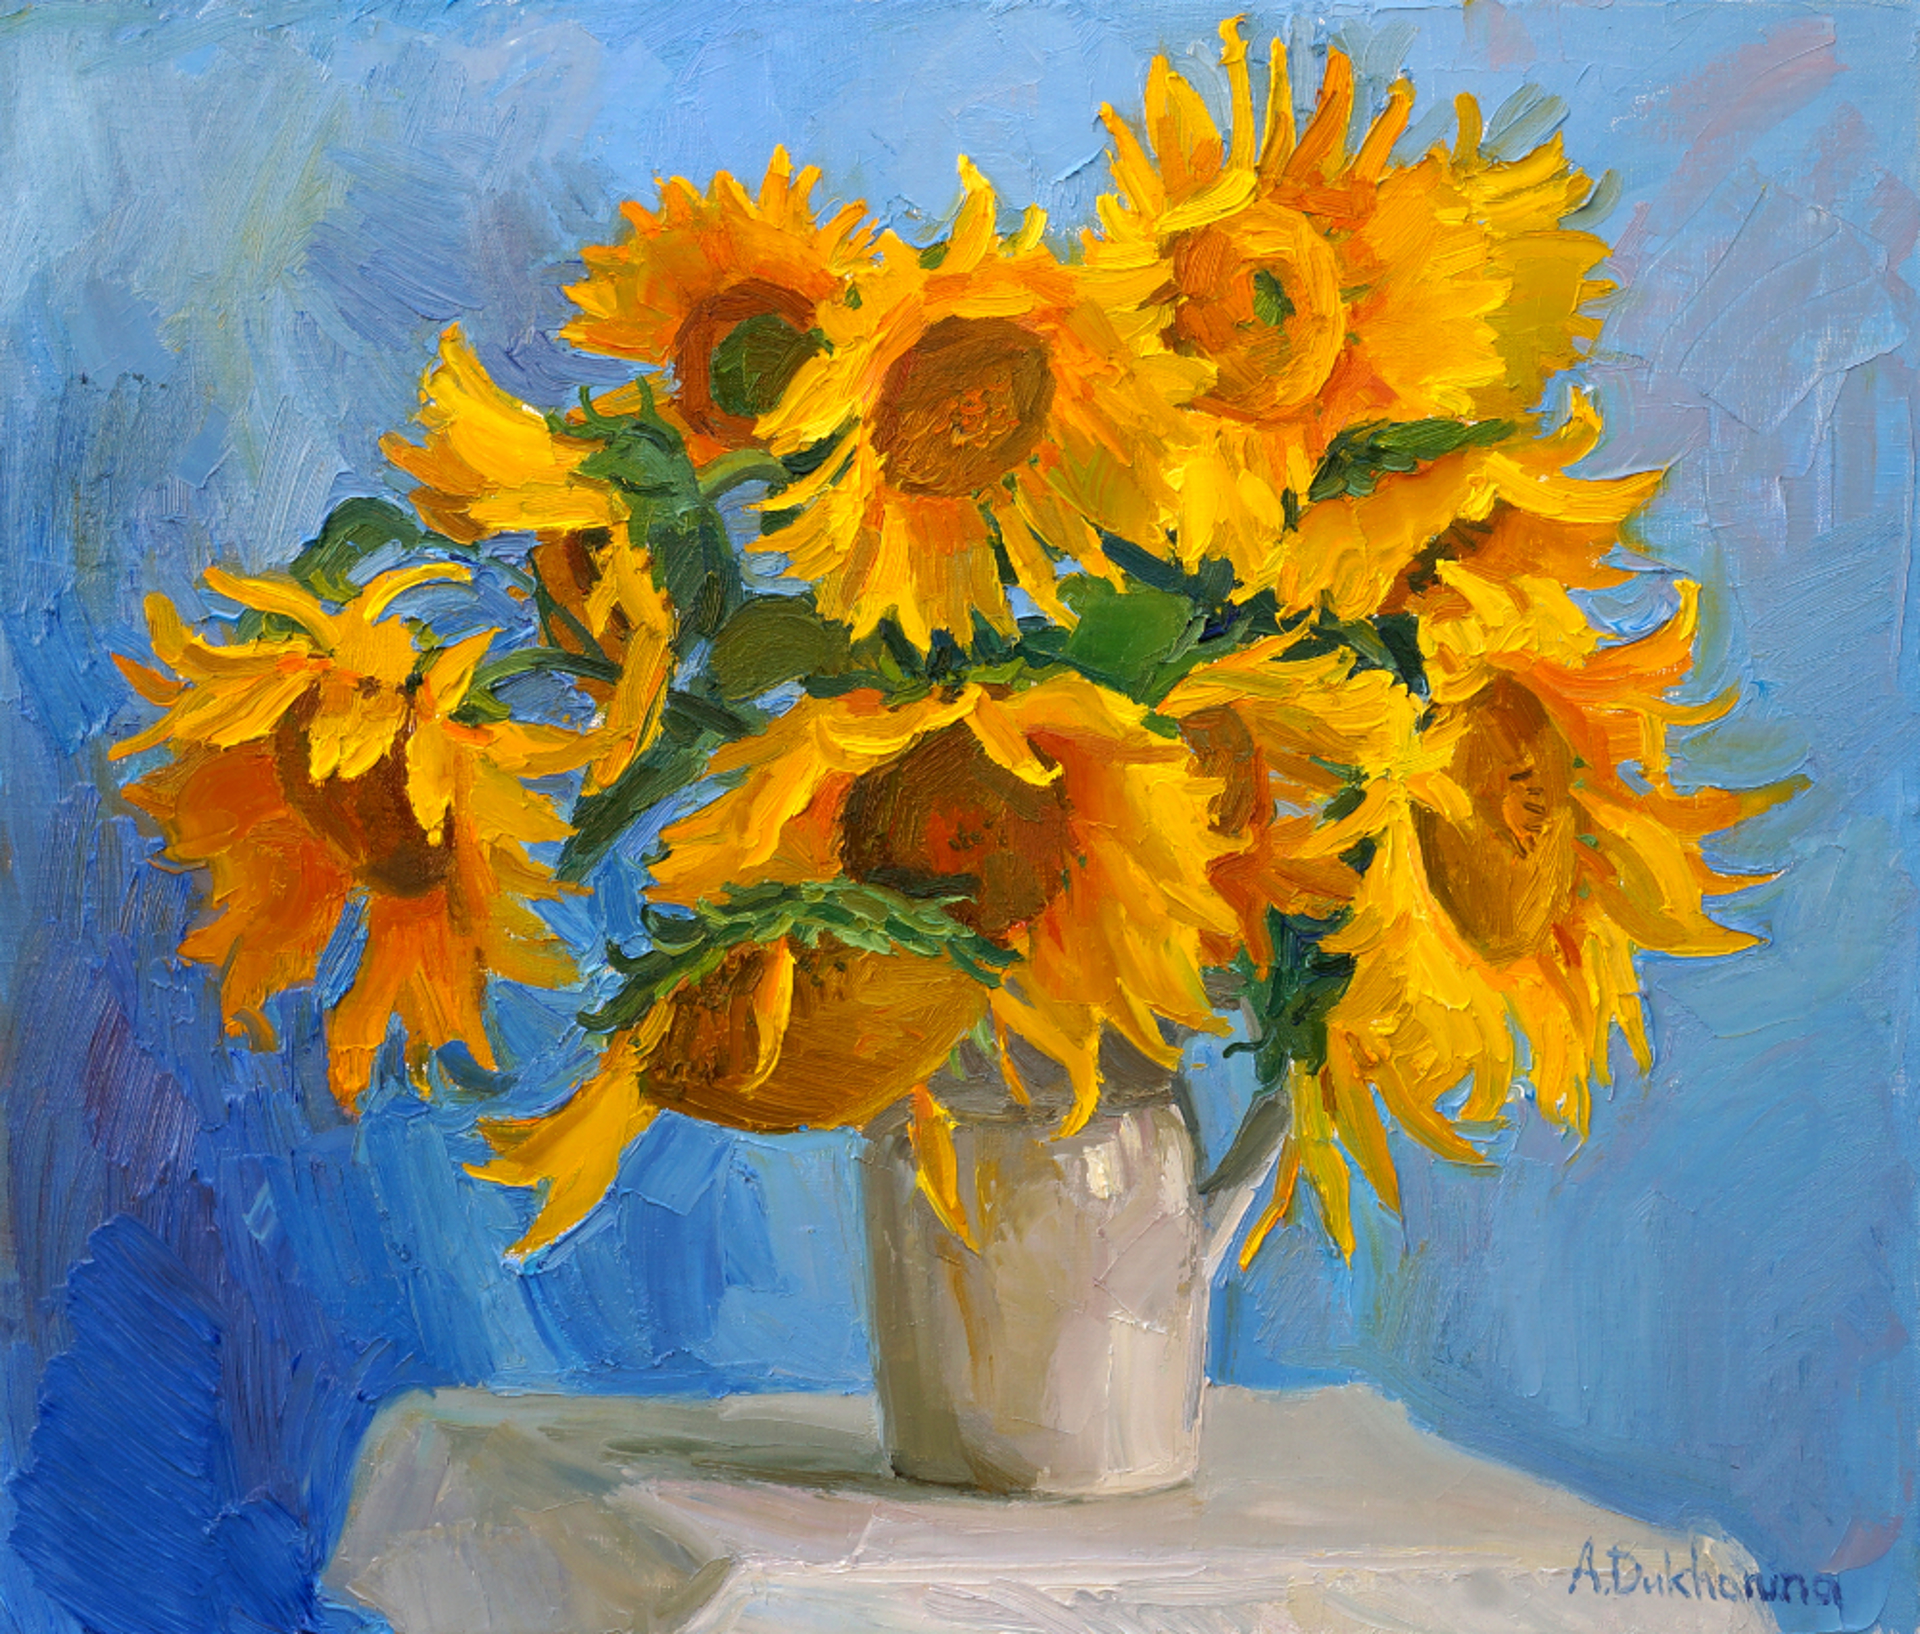 Yellow and Blue by Anastasia Dukhanina